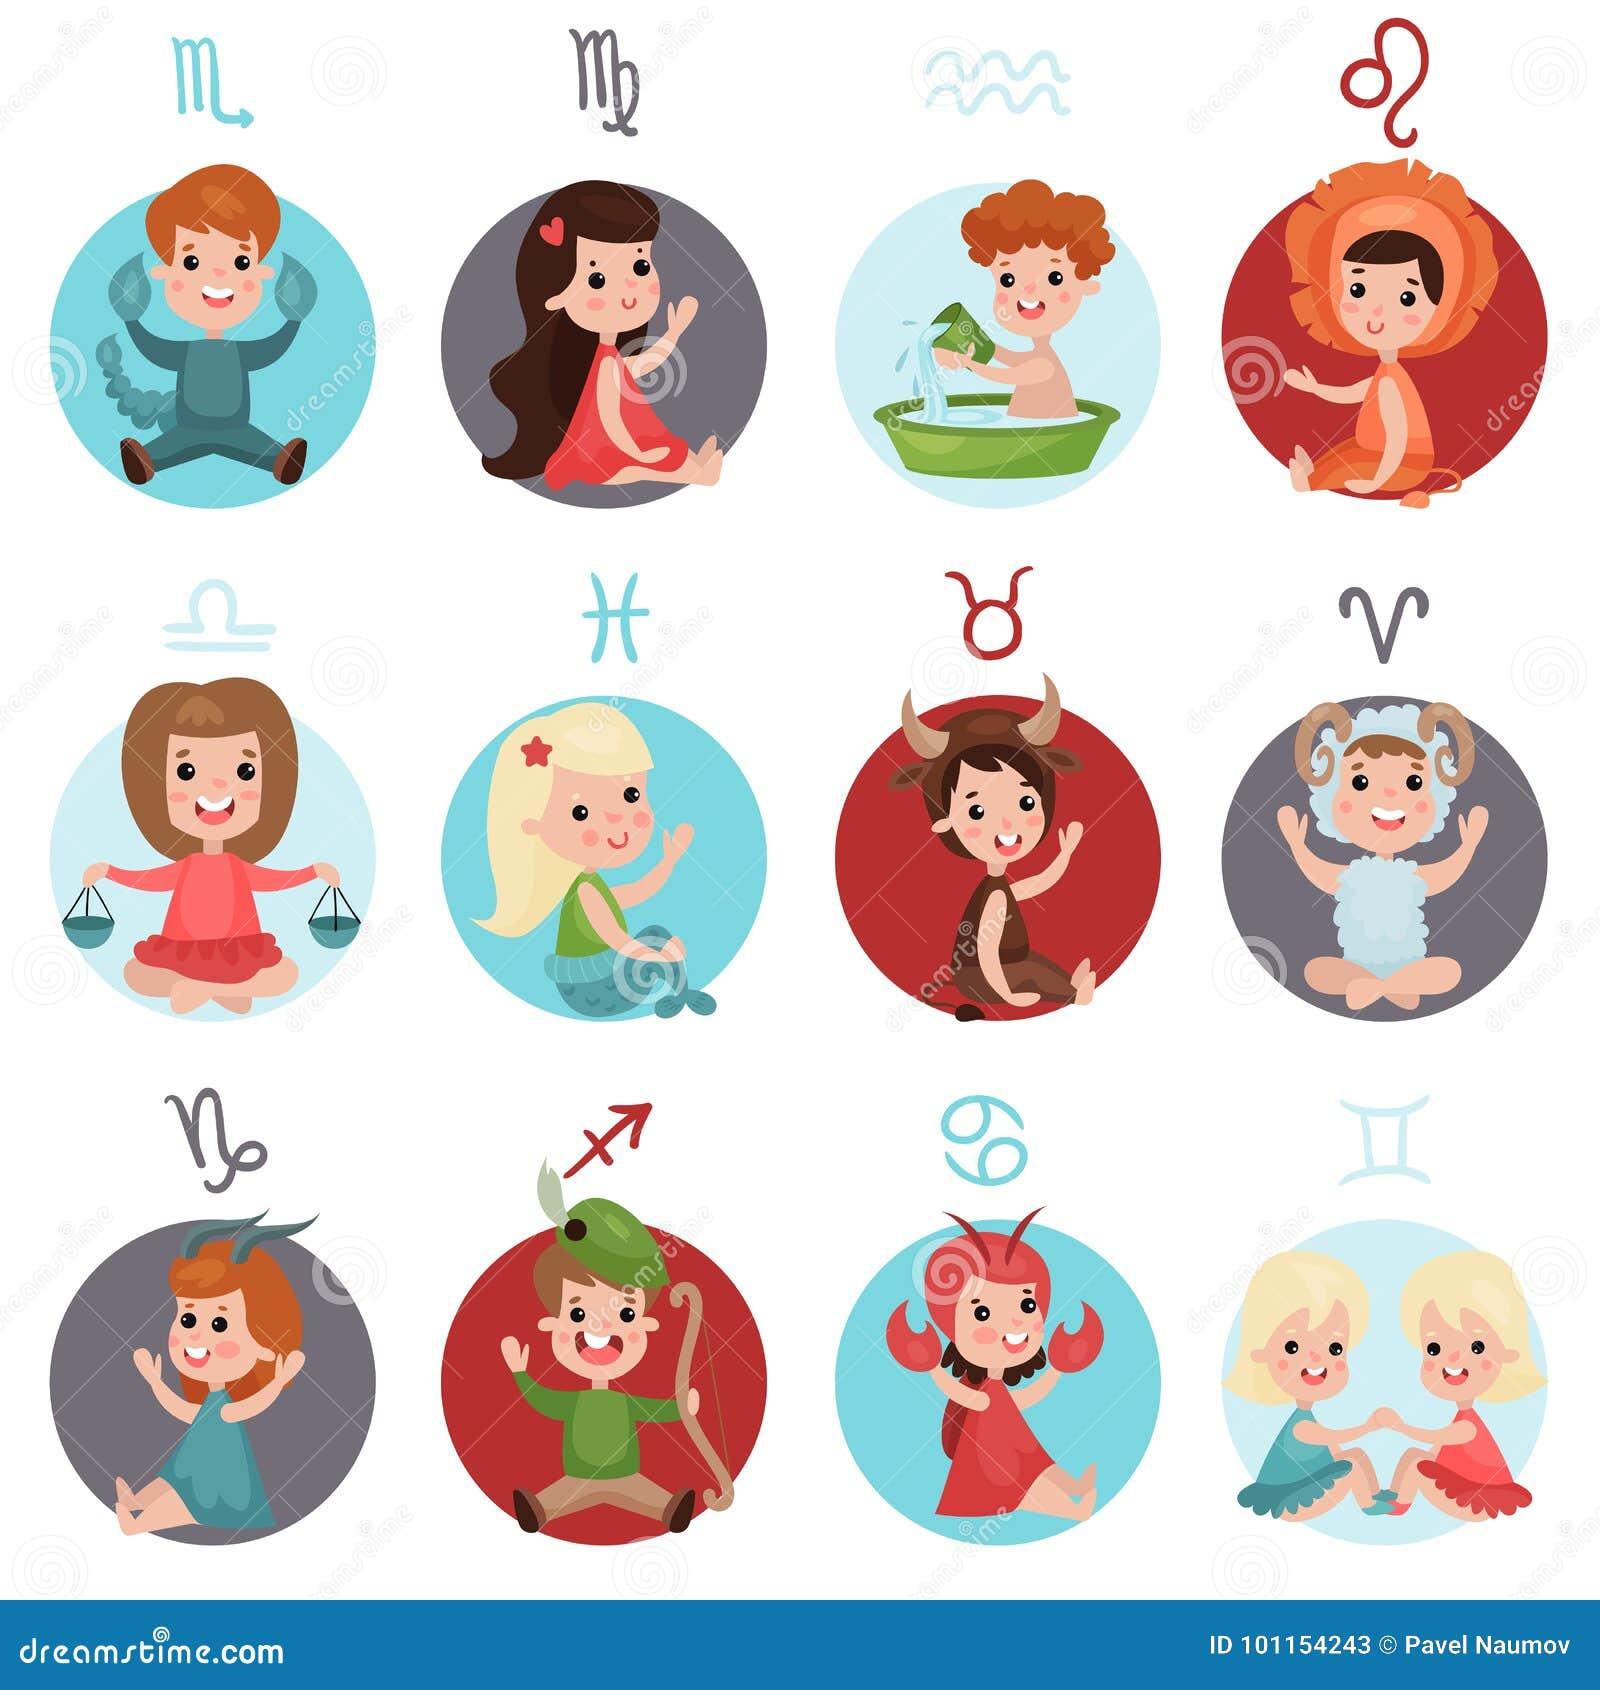 Adorable little kids wearing zodiac signs costumes set twelve adorable little kids wearing zodiac signs costumes set twelve cute zodiac symbols cartoon illustrations buycottarizona Images